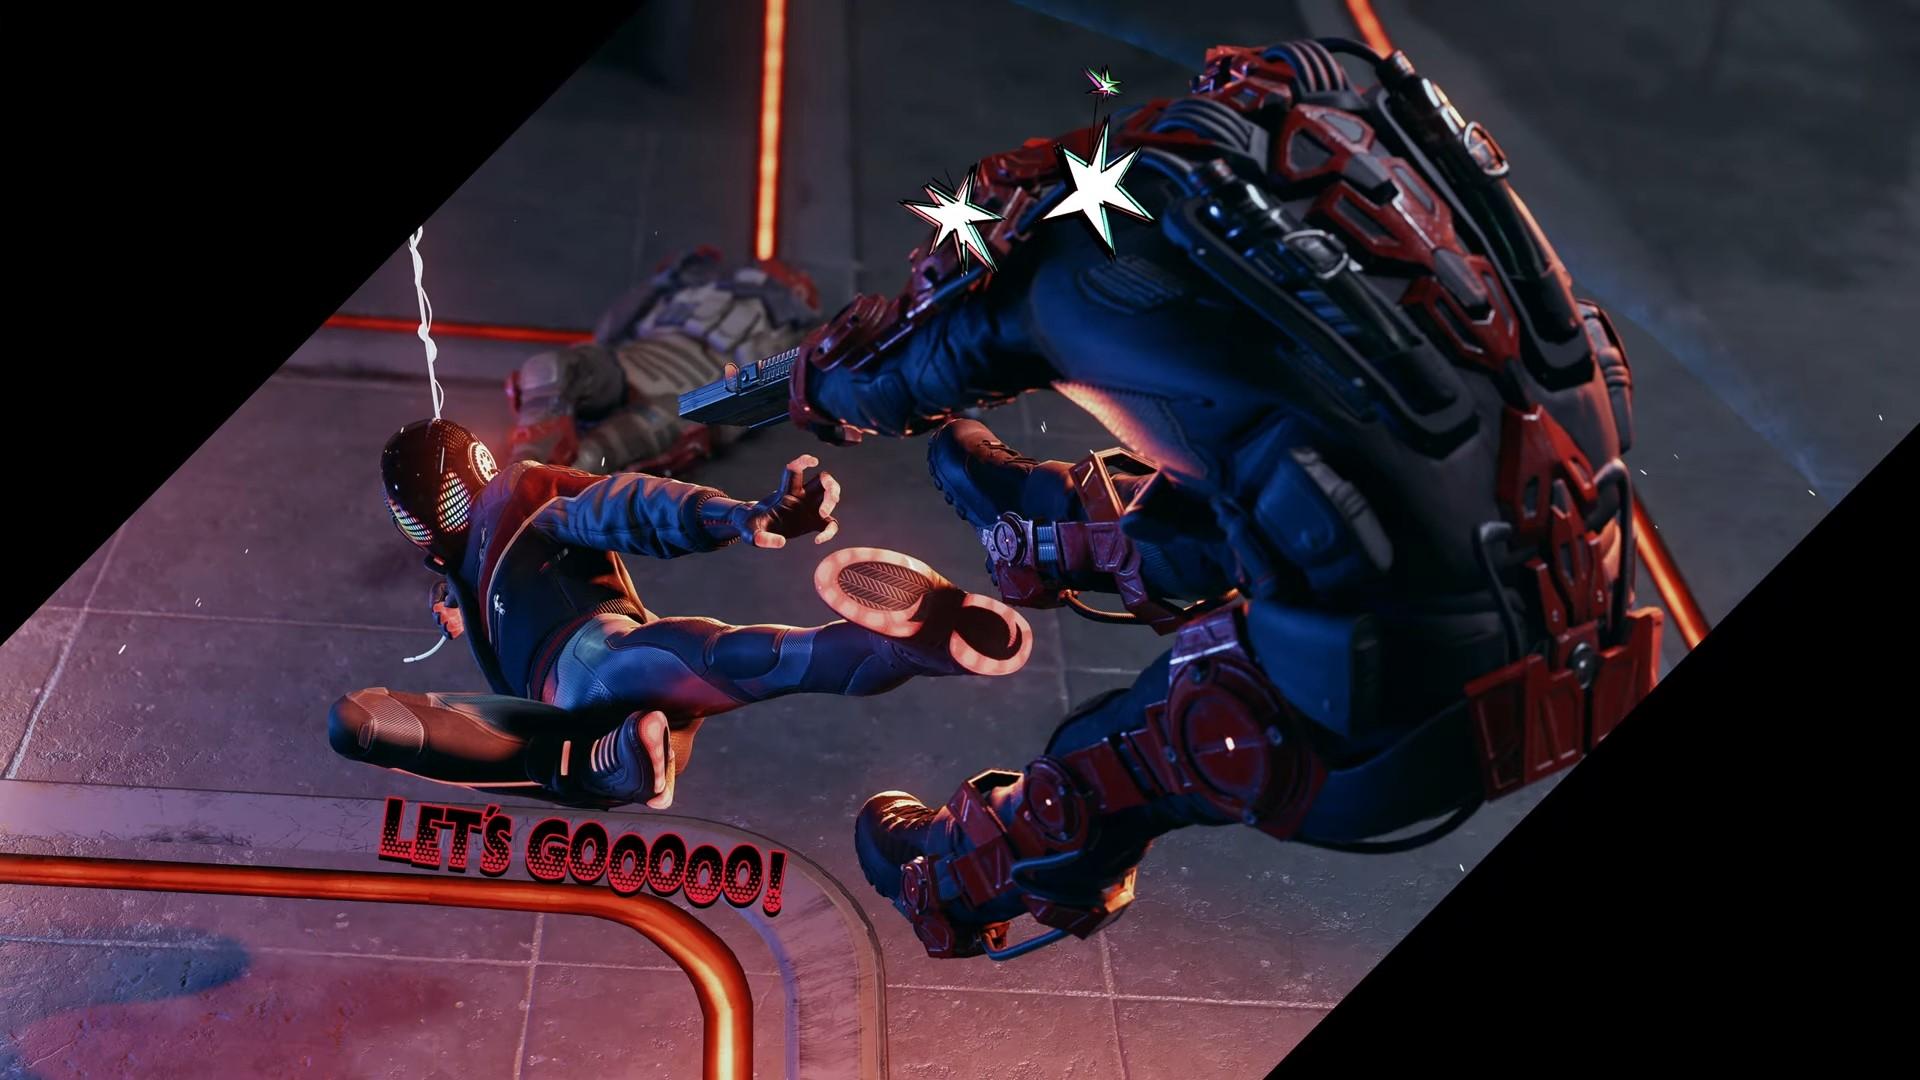 Marvels Spider-Man Miles Morales Photo Mode 2